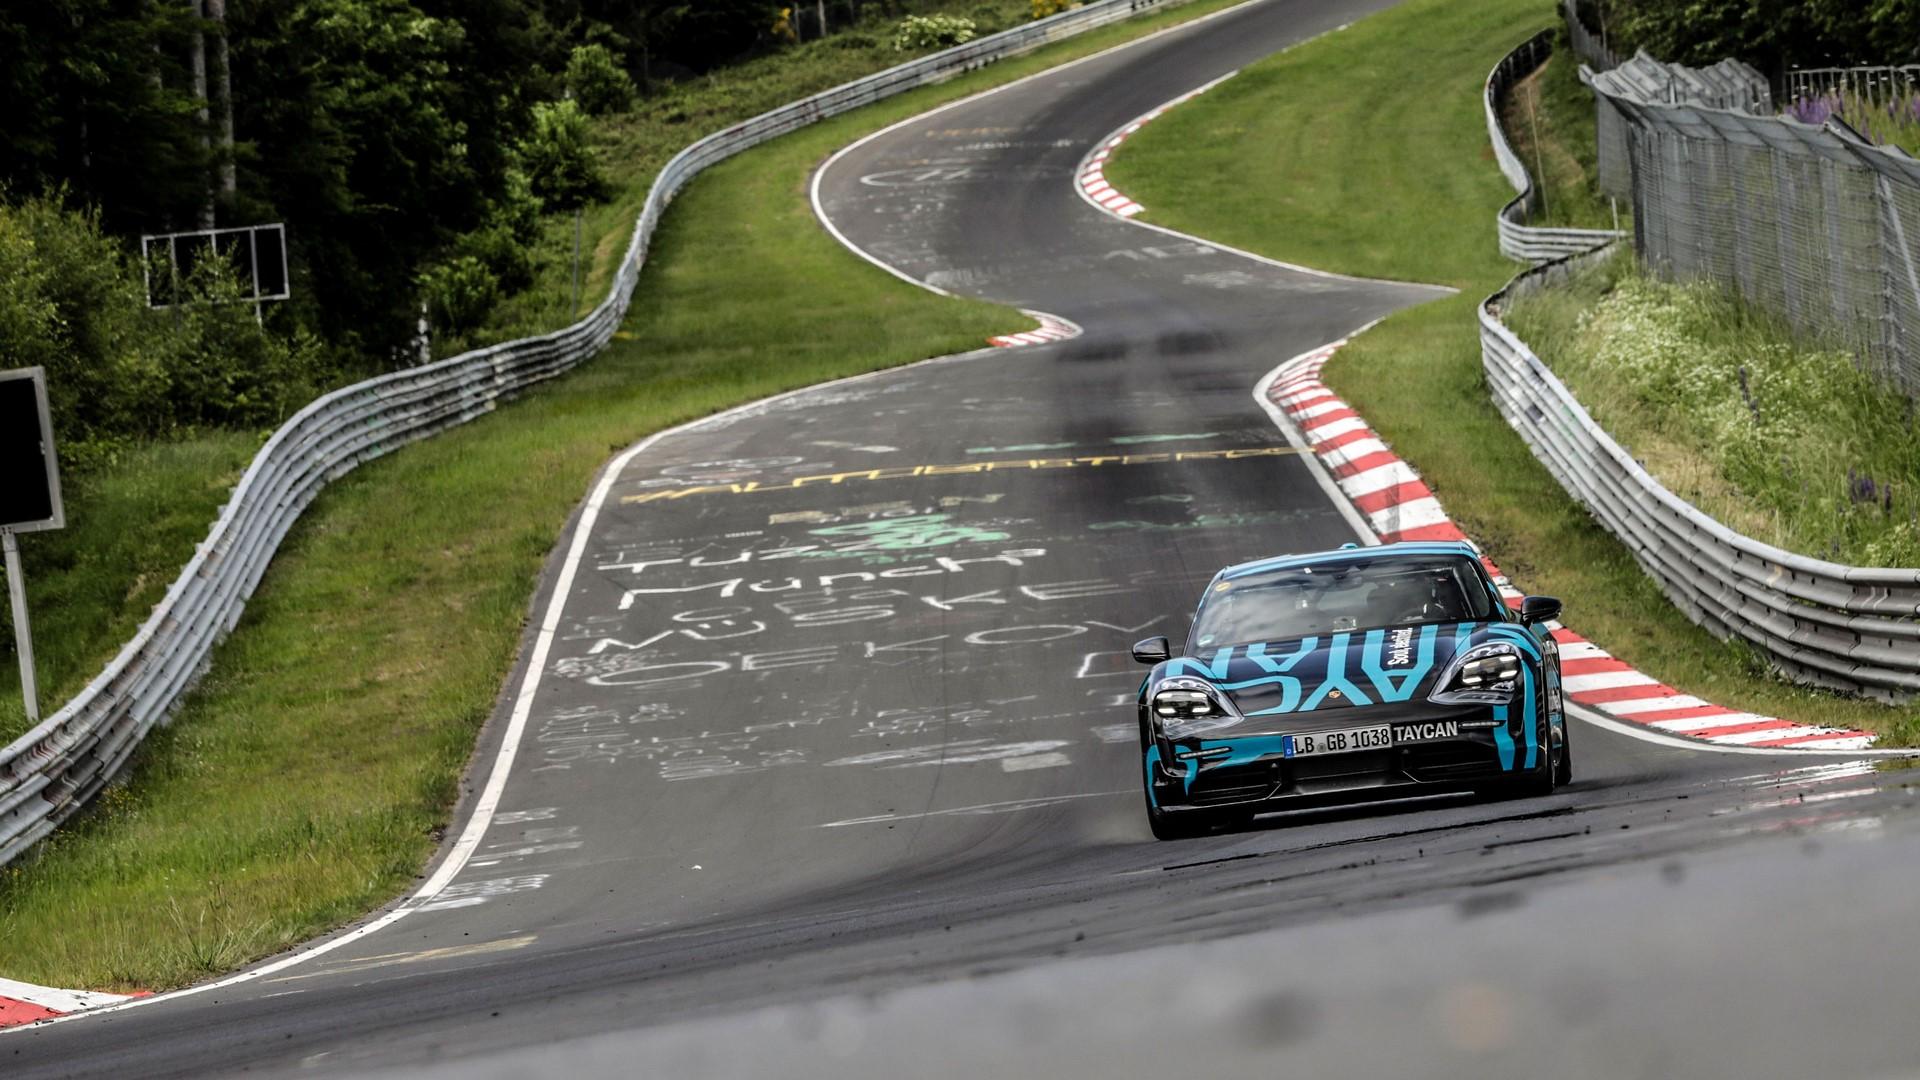 Porsche-Taycan-Nurburgring-record-7